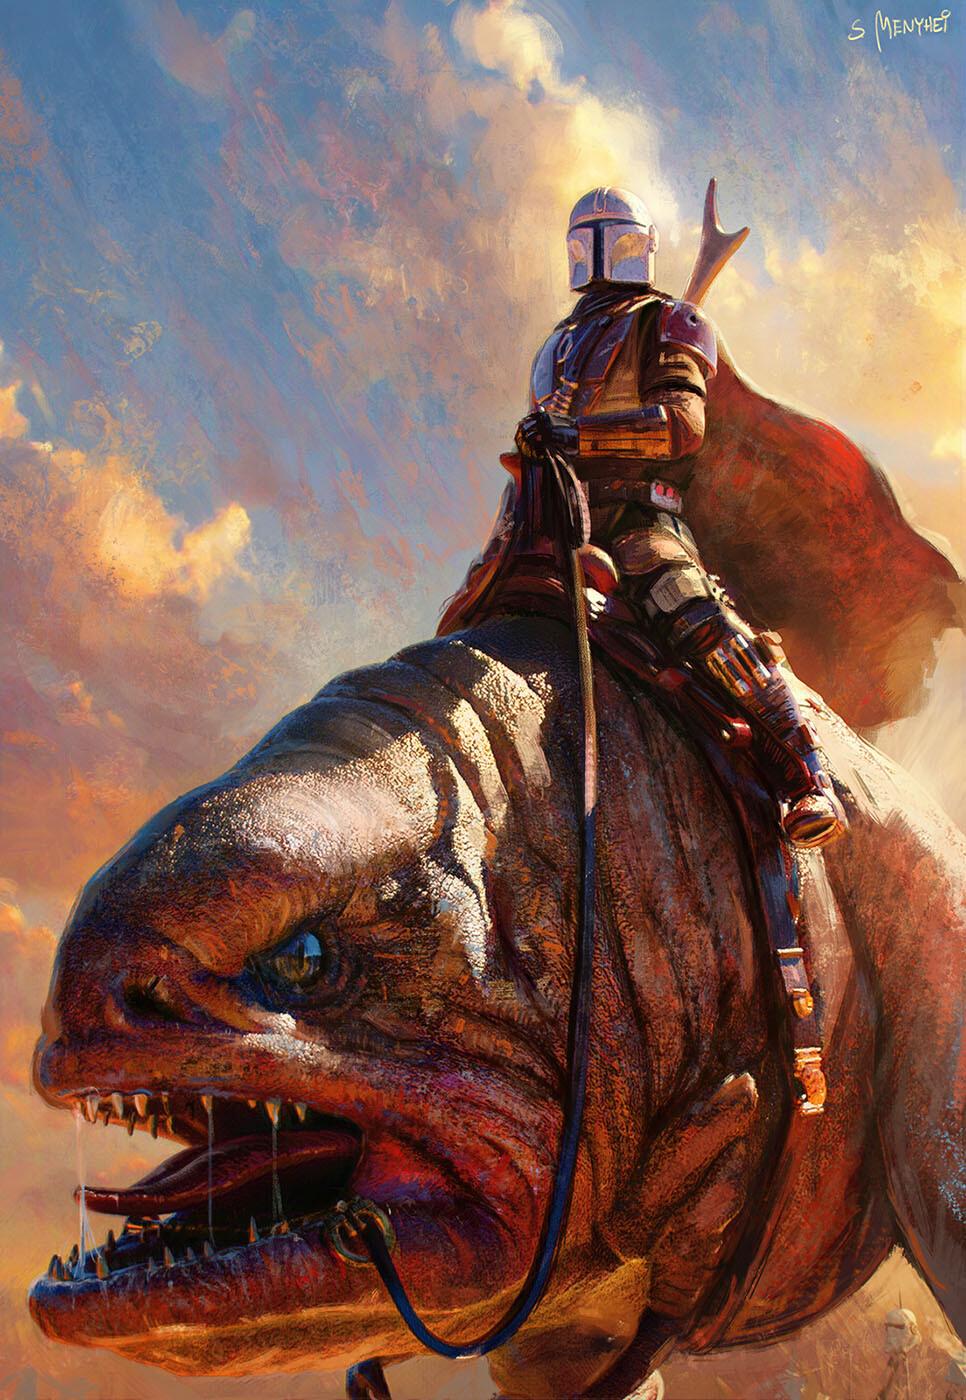 The Digital Sci-Fi & Fantasy Art of Saby Menyhei